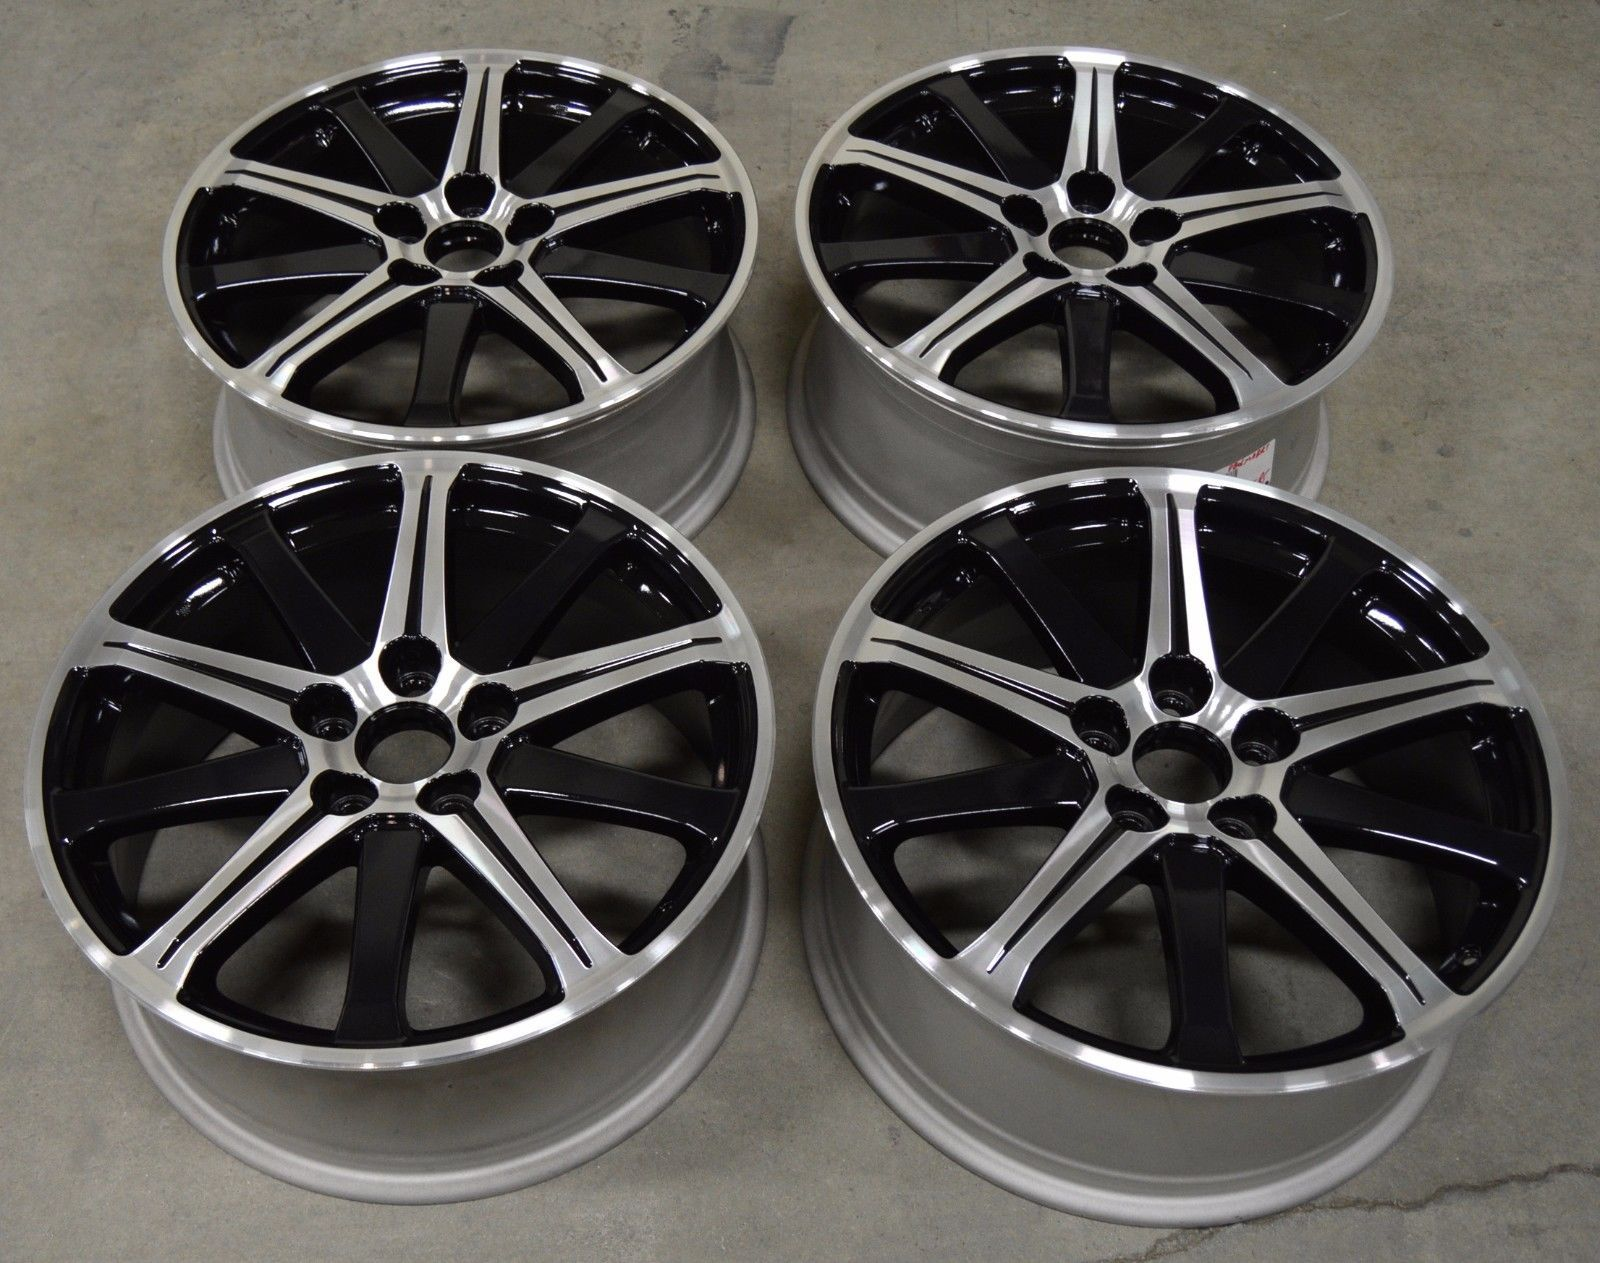 Acura TL Factory OEM Rim Wheel Black - Acura tl 19 oem wheels